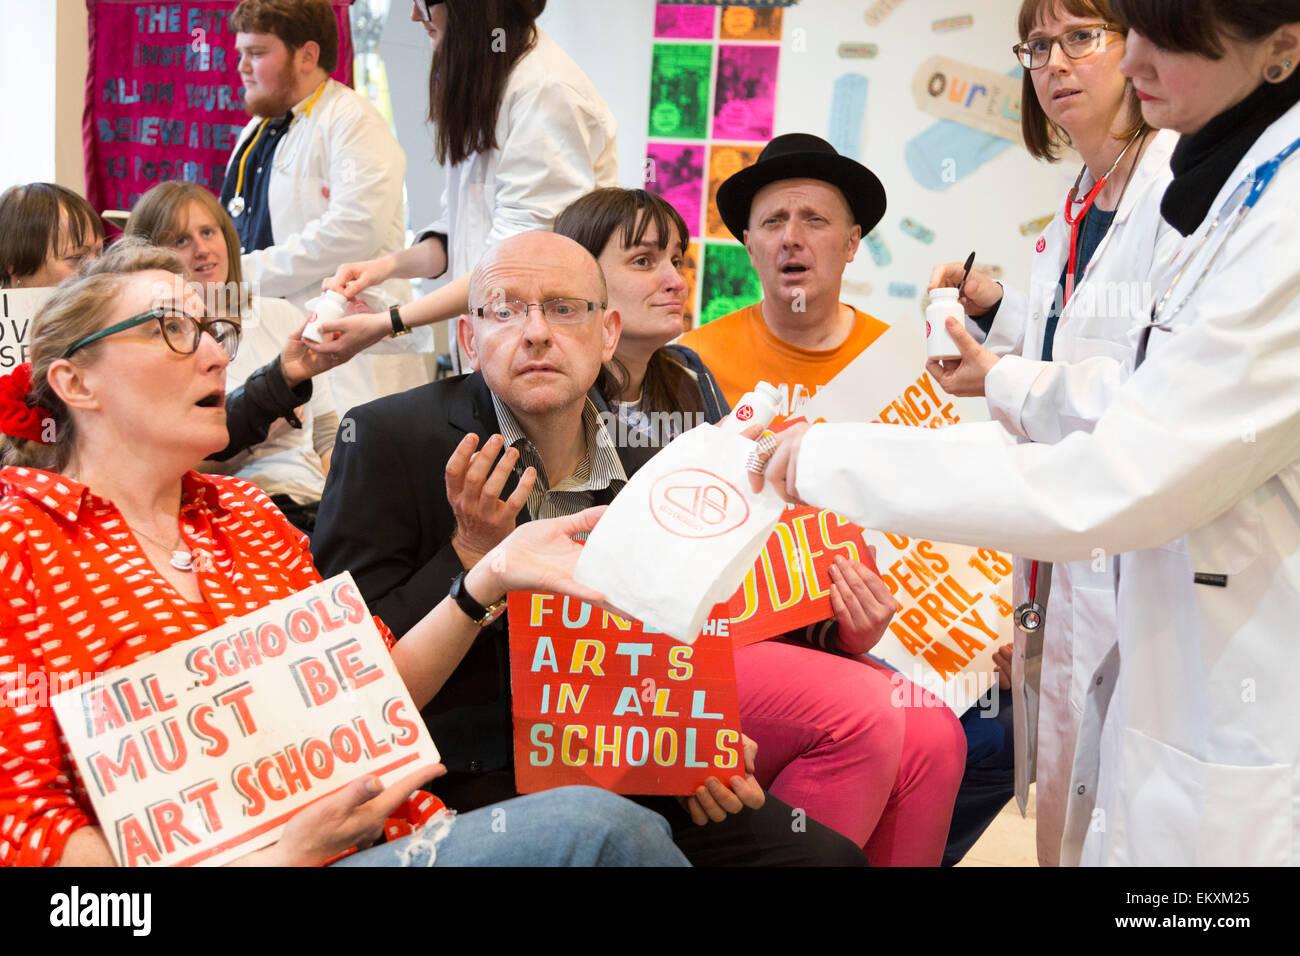 London, UK. 13 April 2015. Artist Bob and Roberta Smith (orange T-shirt) poses with BA and MA fine art students, - Stock Image